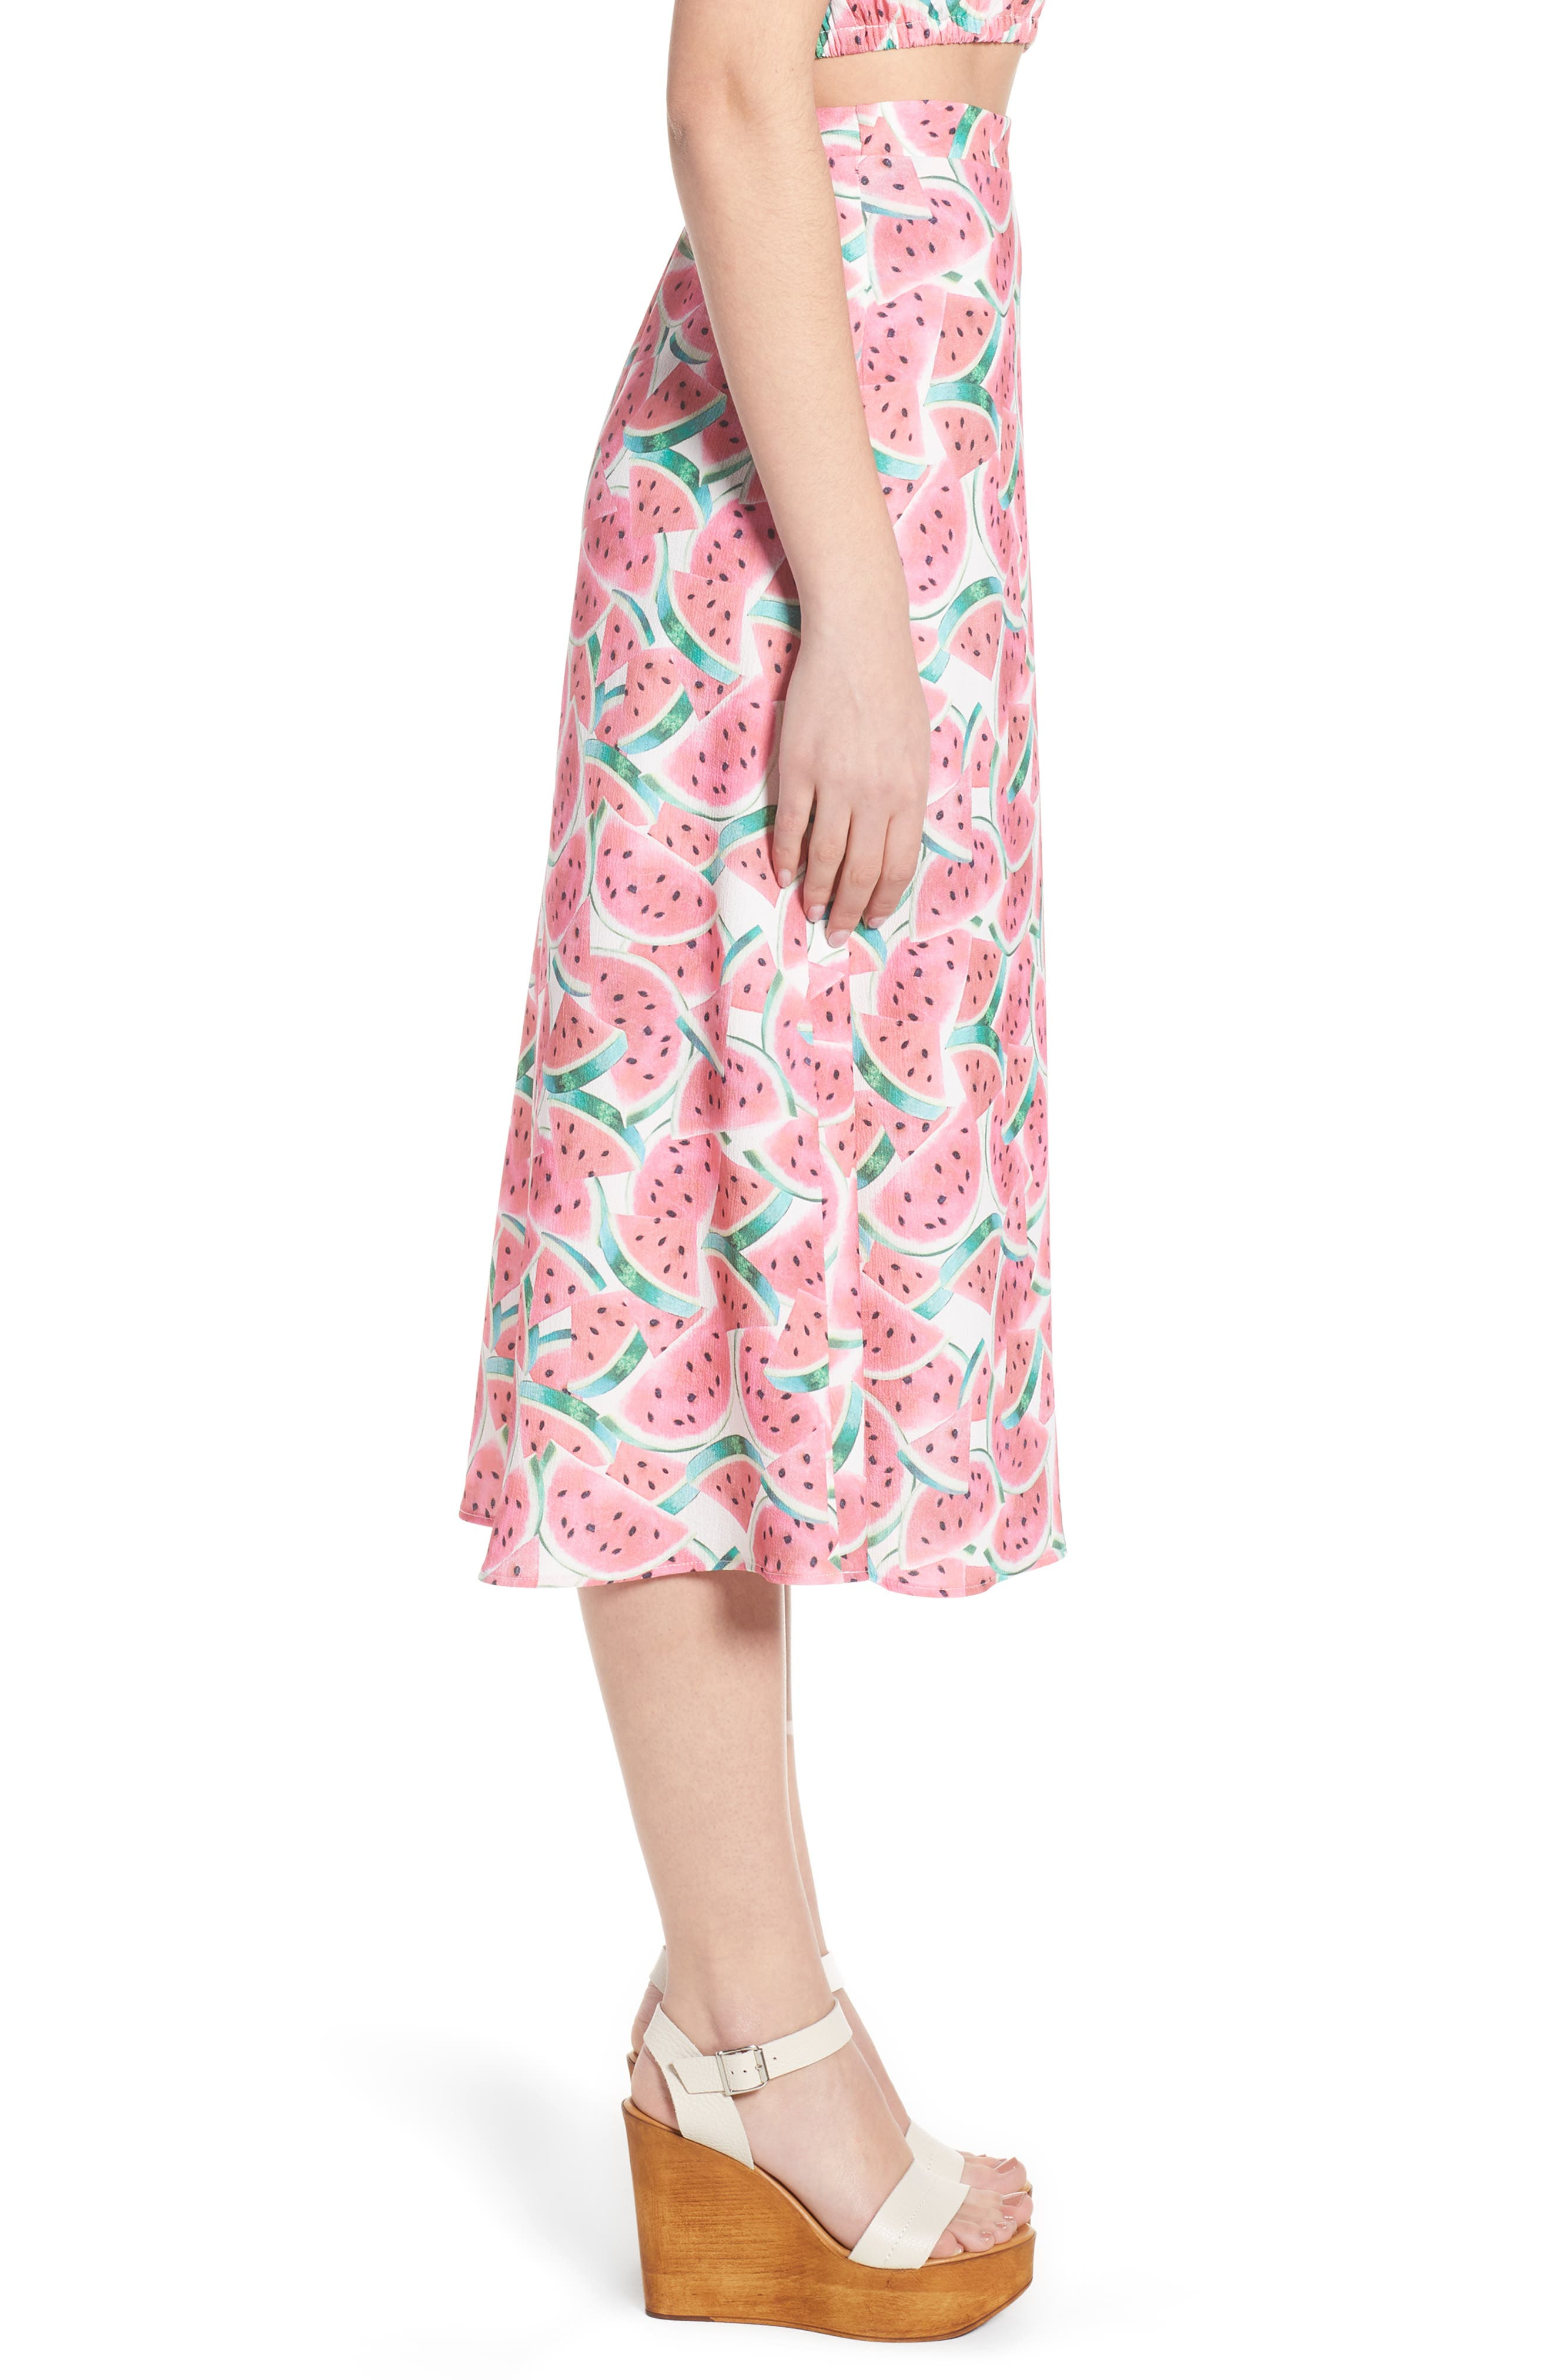 Flirt Midi Skirt,                             Alternate thumbnail 7, color,                             One In A Melon Crinkle Stretch